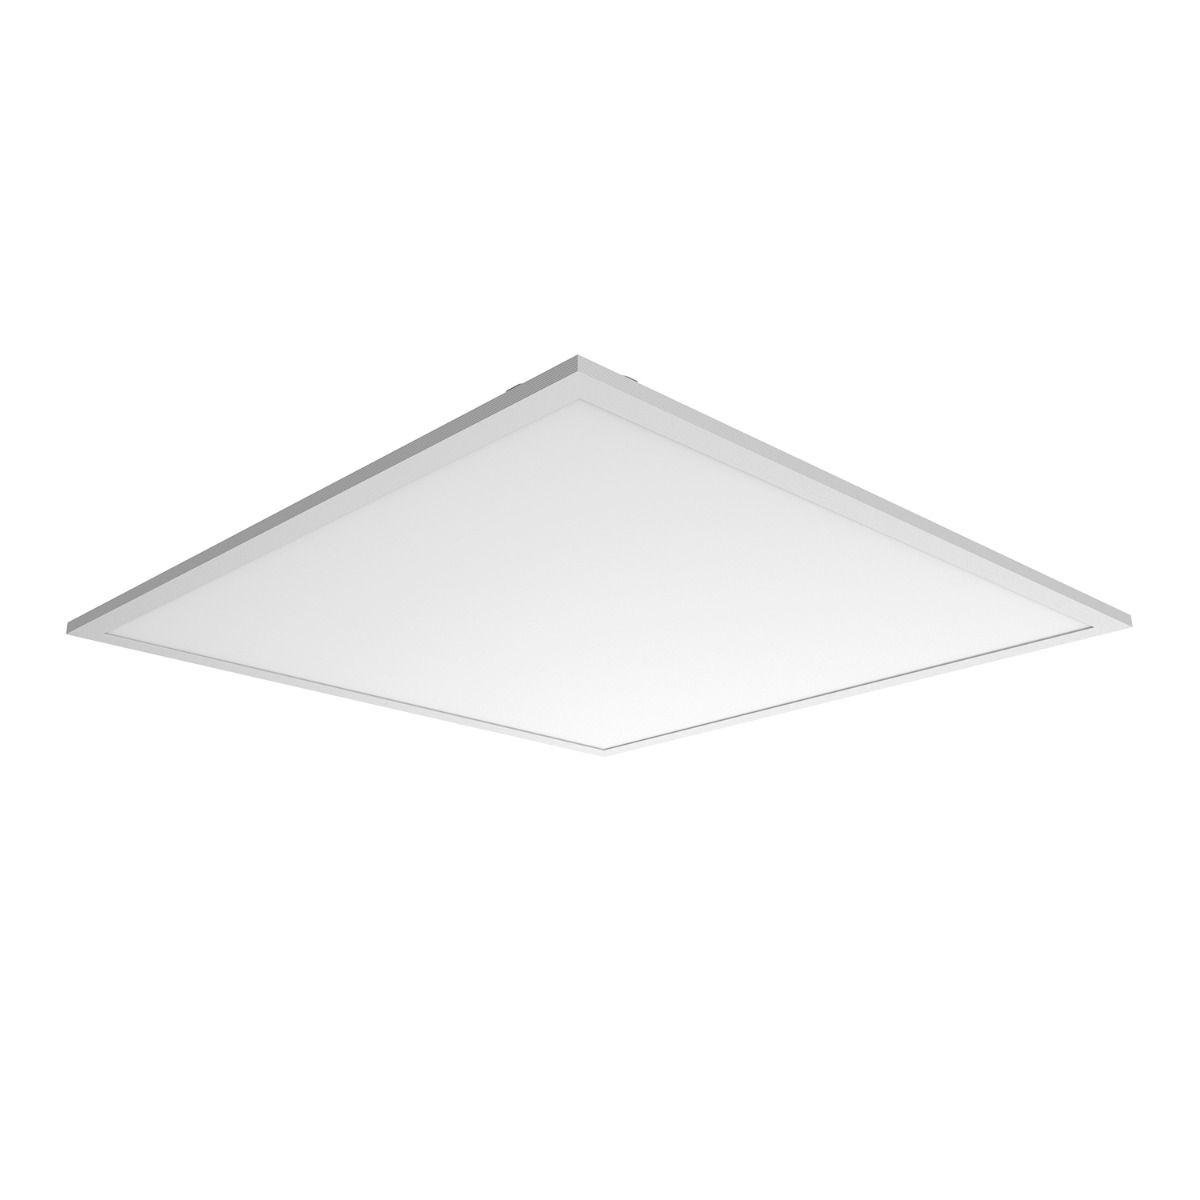 Noxion Panel LED Delta Pro V3 30W 4000K 4070lm 60x60cm UGR <22 | Blanco Frio - Reemplazo 4x18W